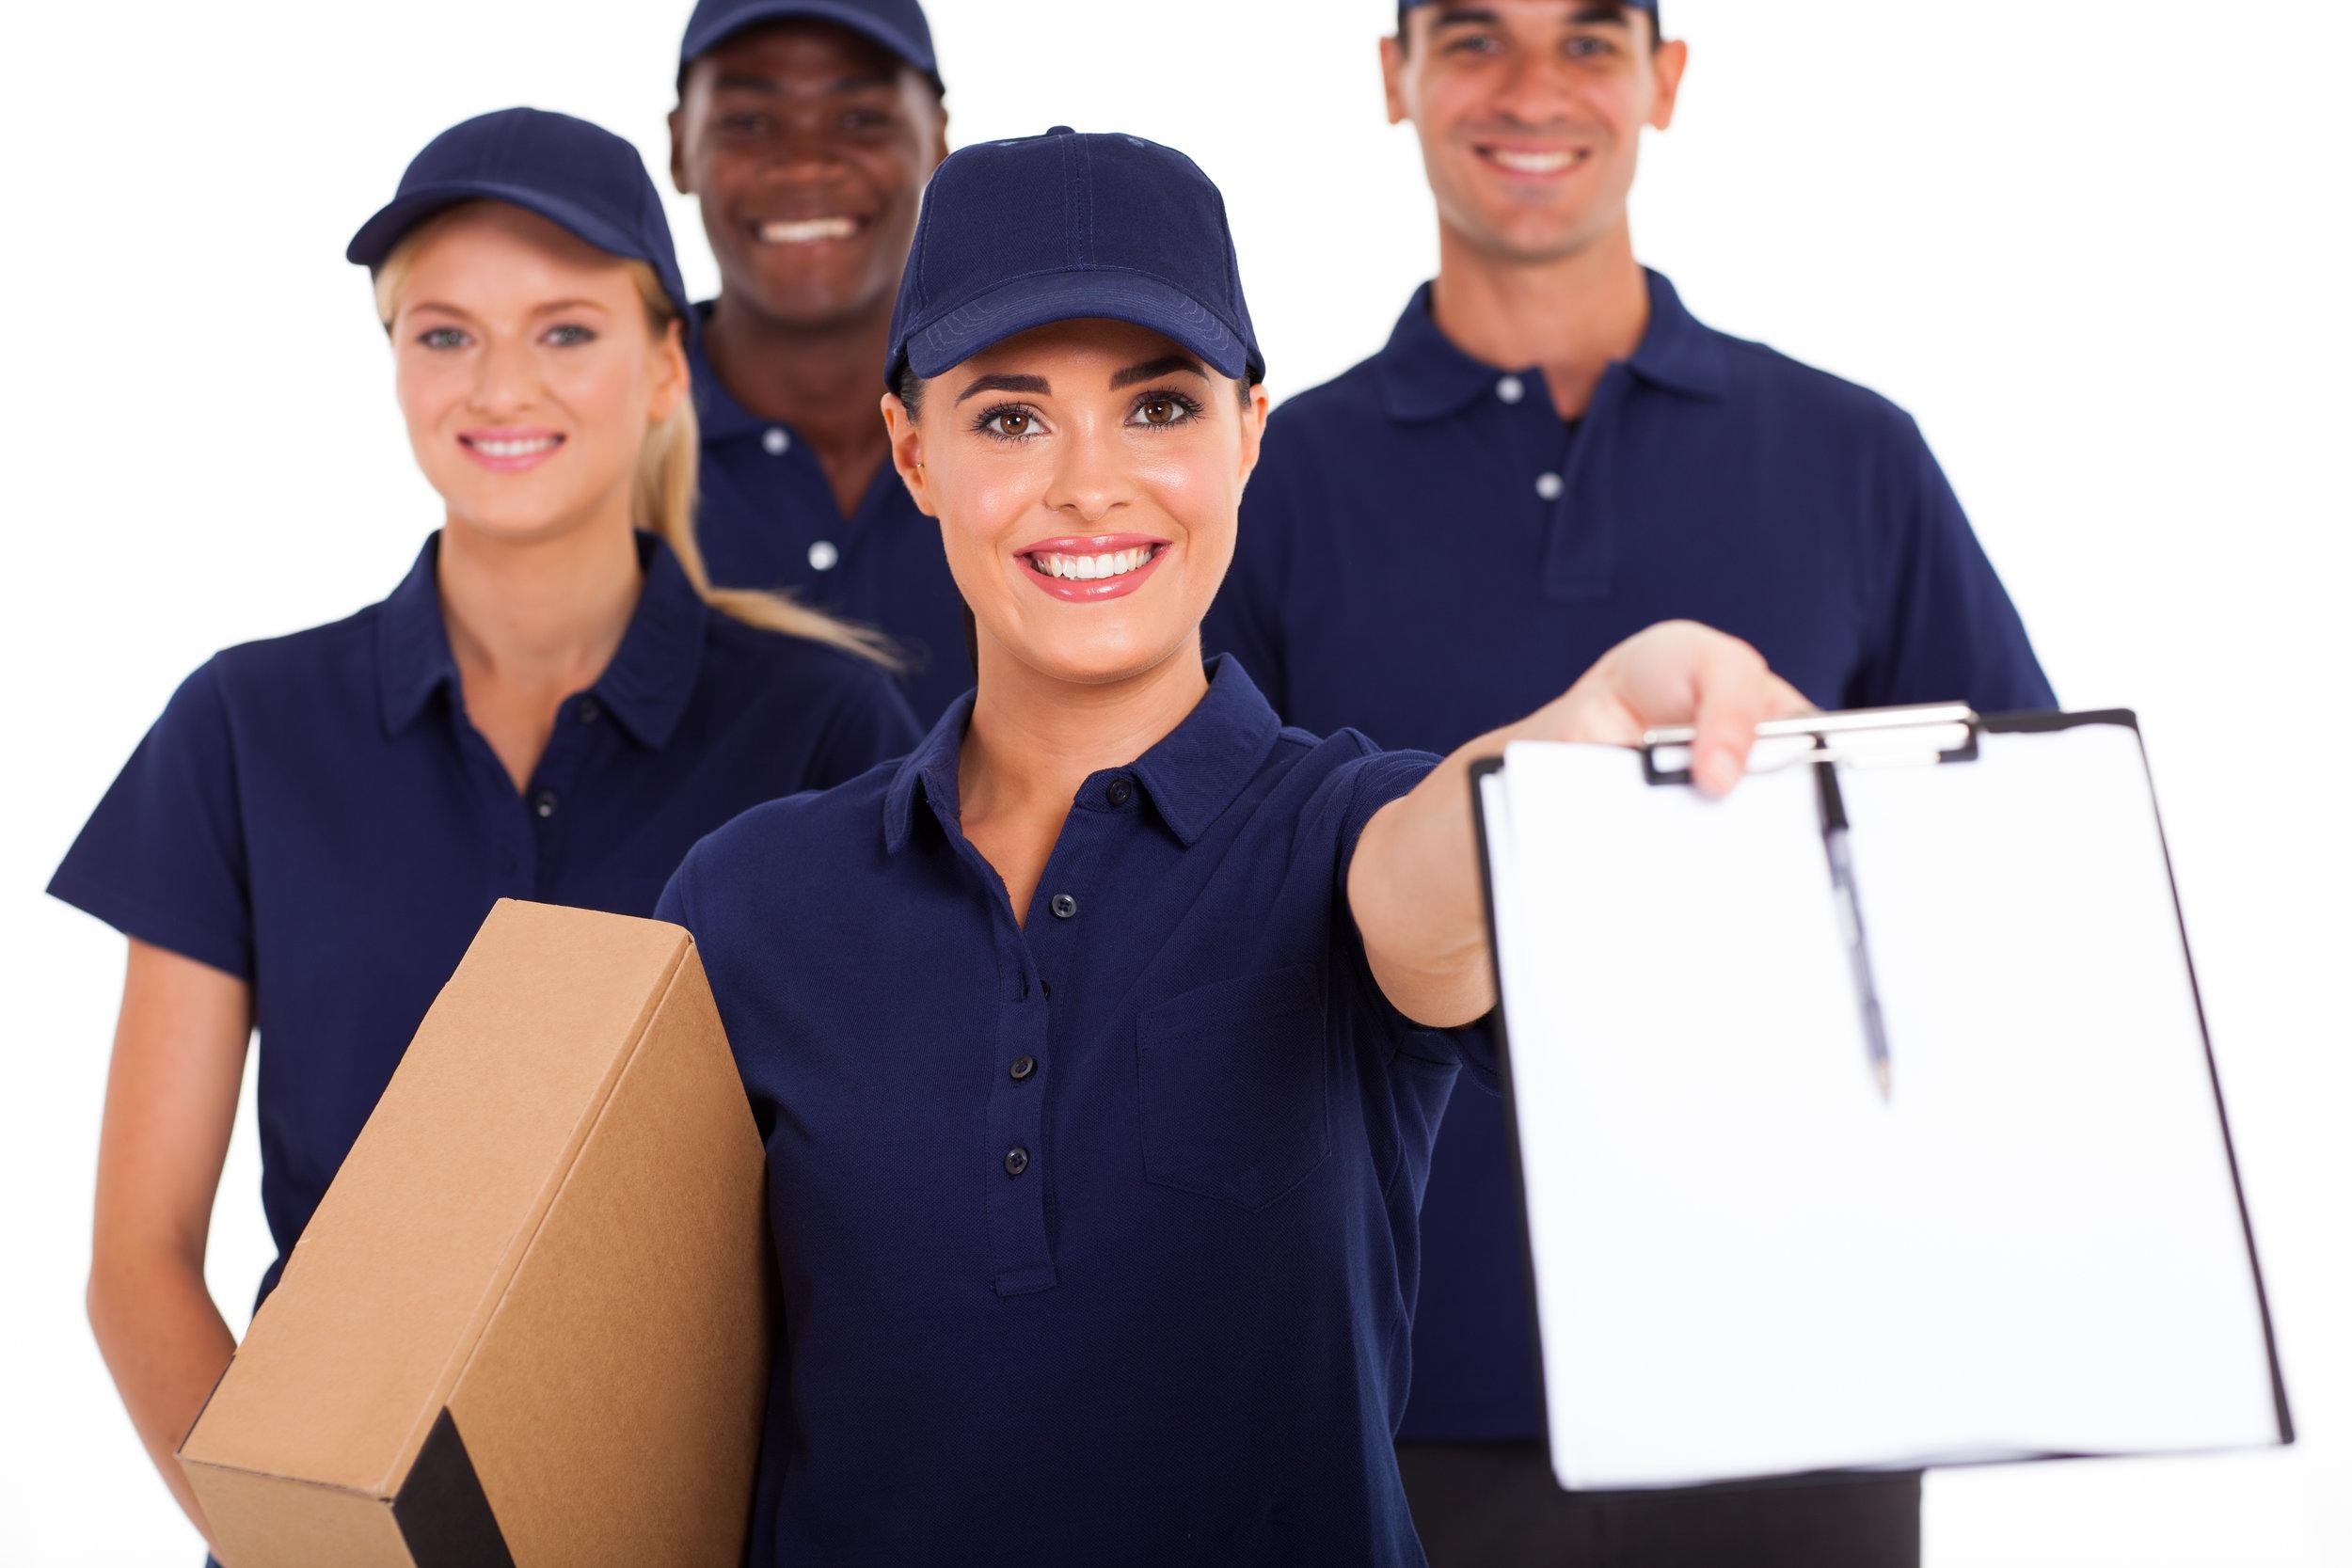 jacksonville-nc-courier-service